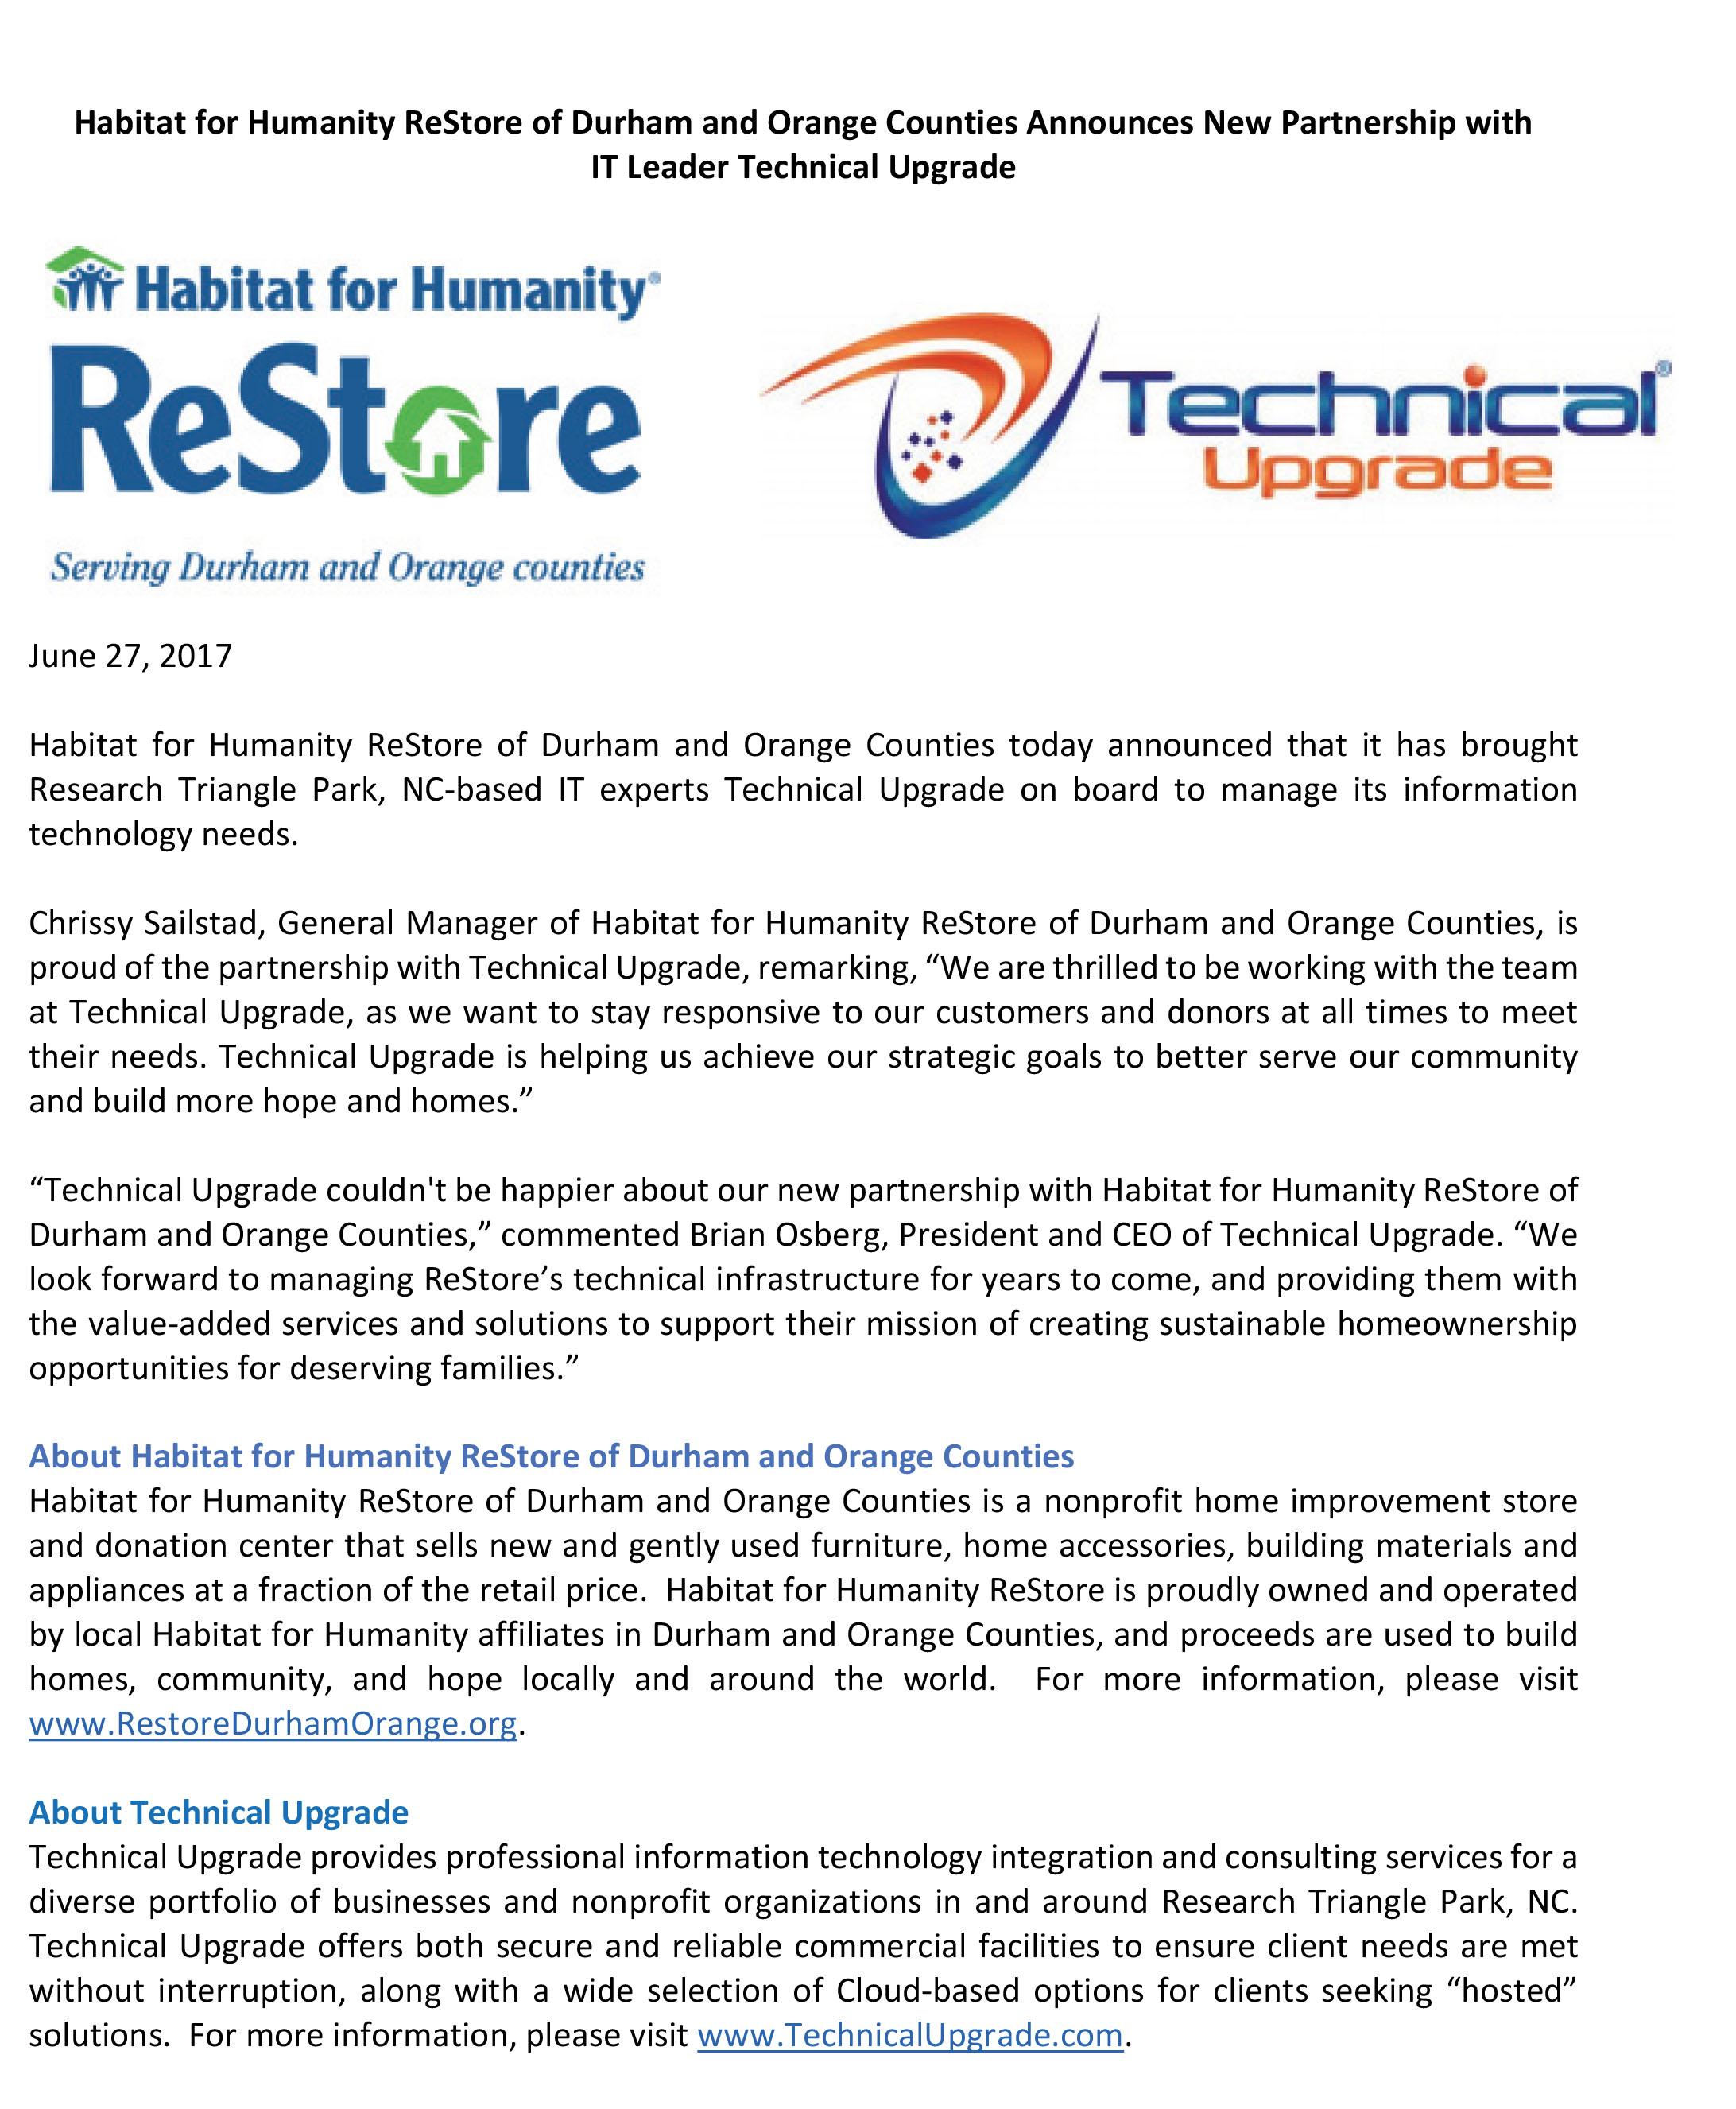 Microsoft Word - 2017_0627_TechnicalUpgrade_HabitatForHumanity_P